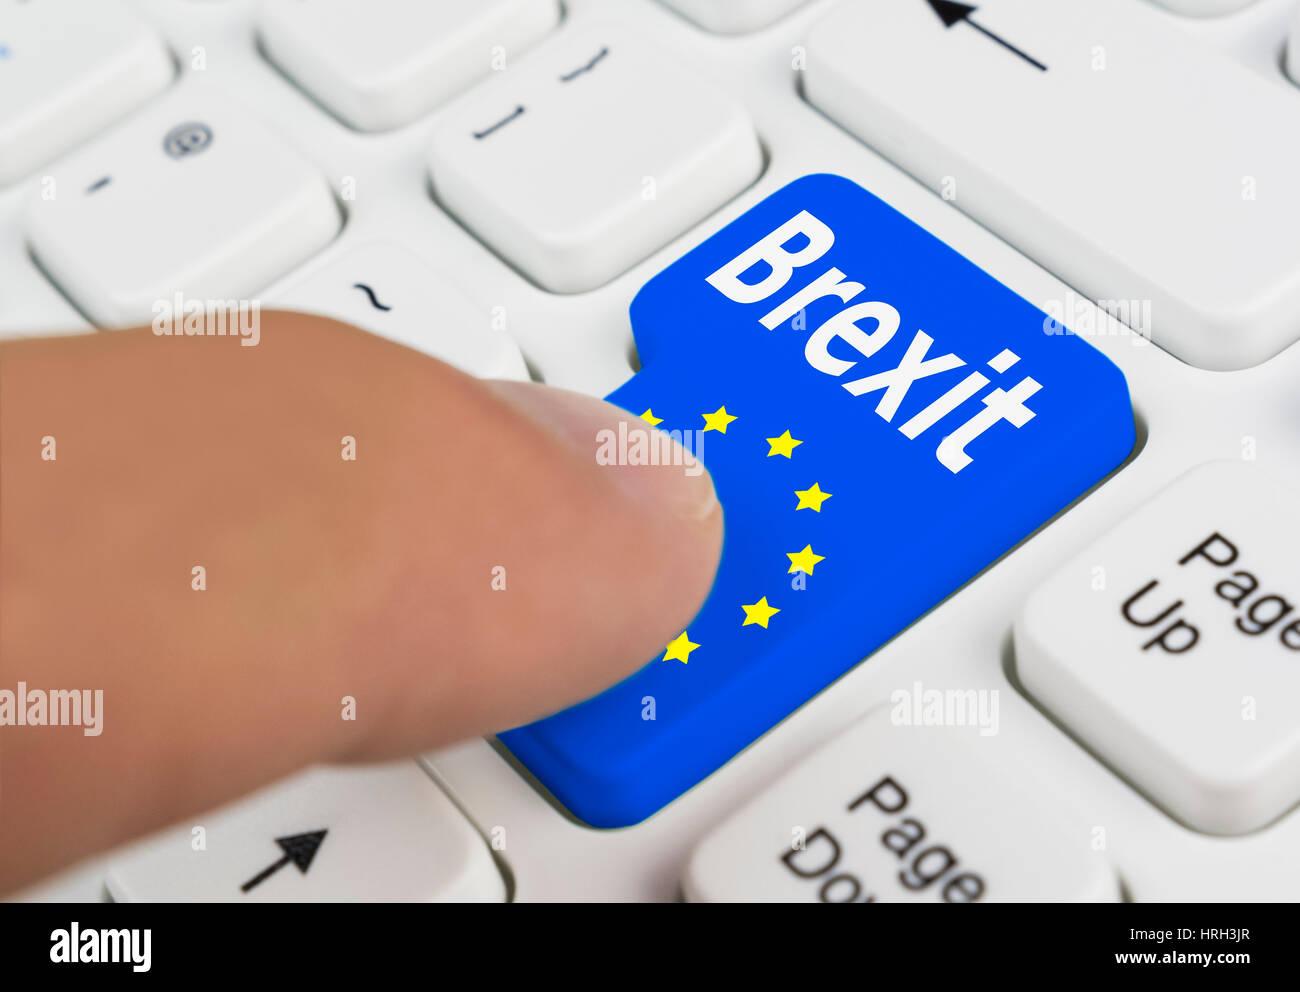 brexit-concept-button-to-symbolise-the-u